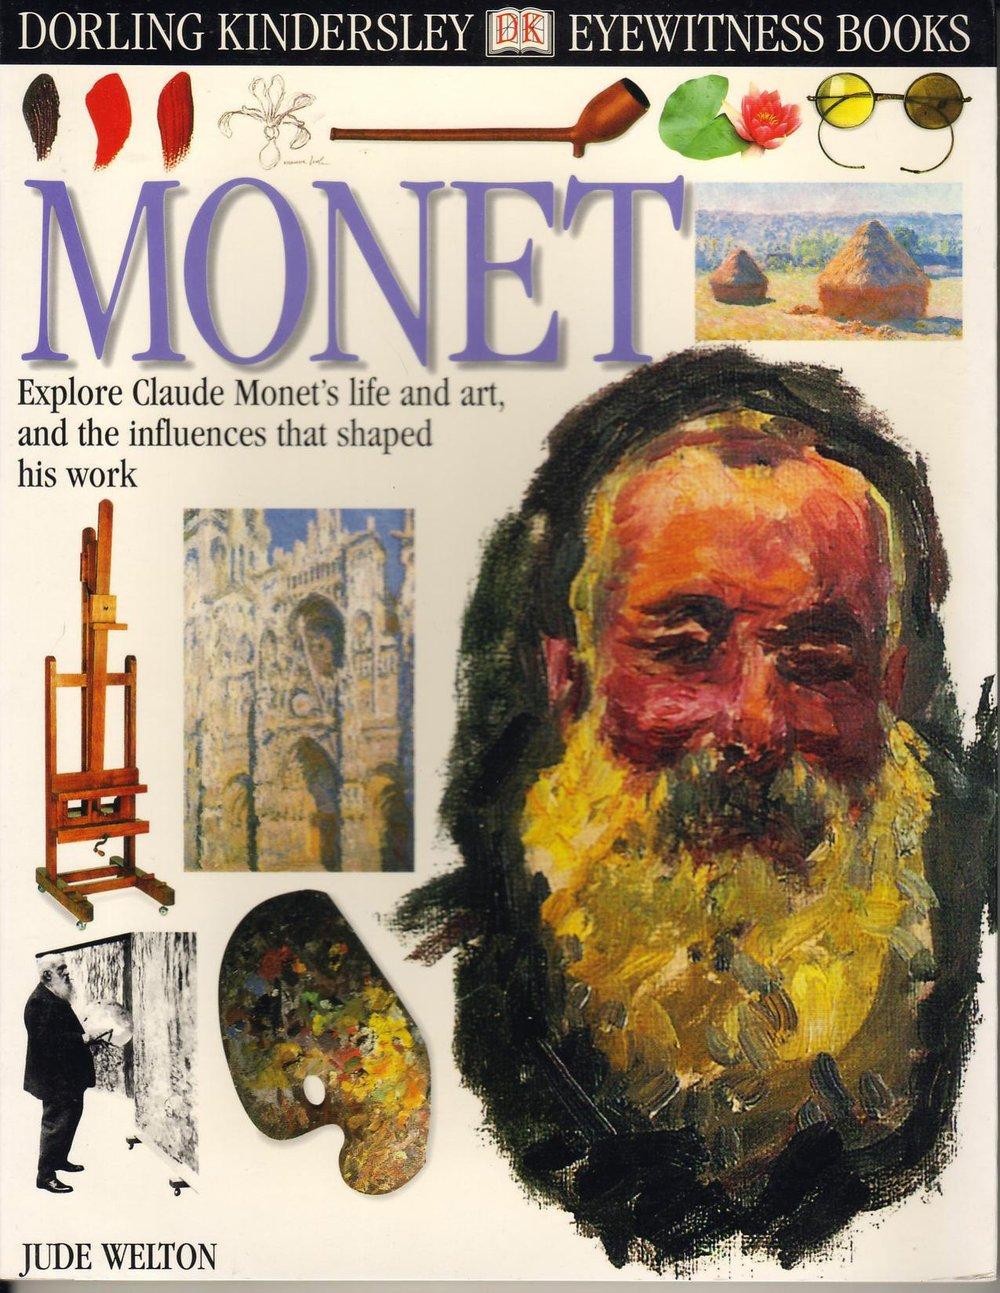 Books DK Eyewitness Art Monet.jpg